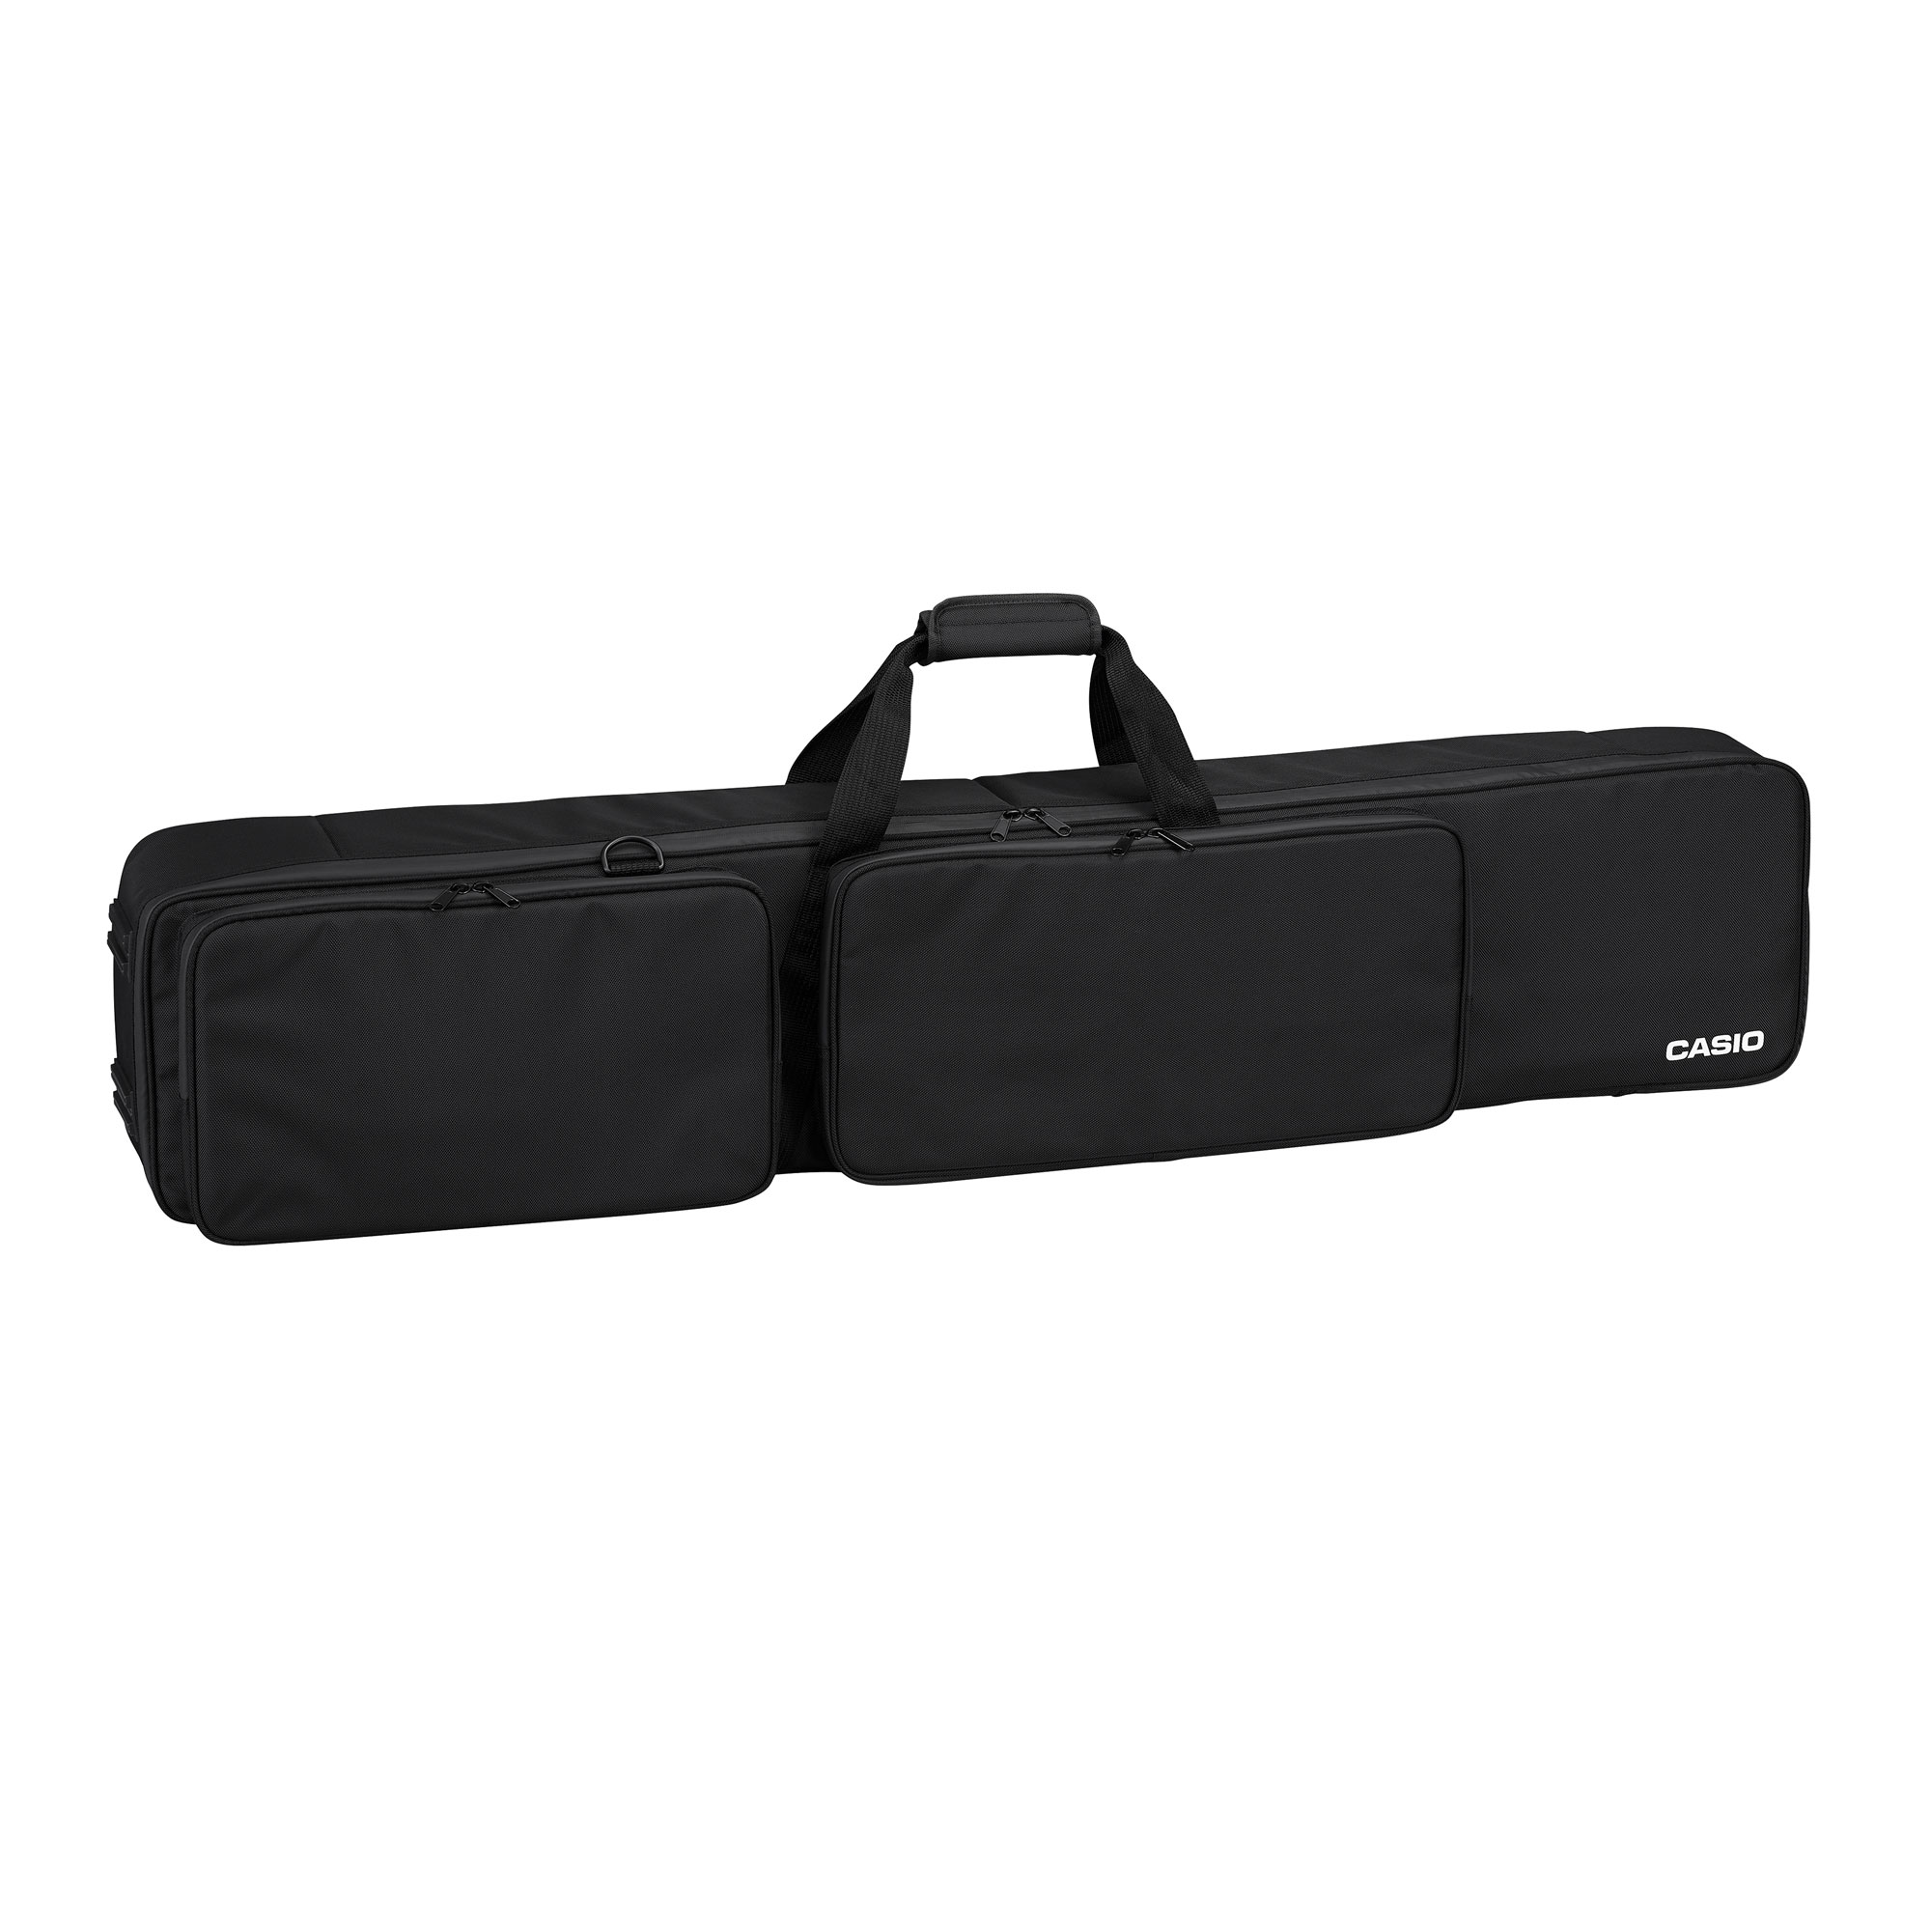 Casio SC-800P Digitalpiano Bag CDPS100/S350 & PX-S1000/S3000